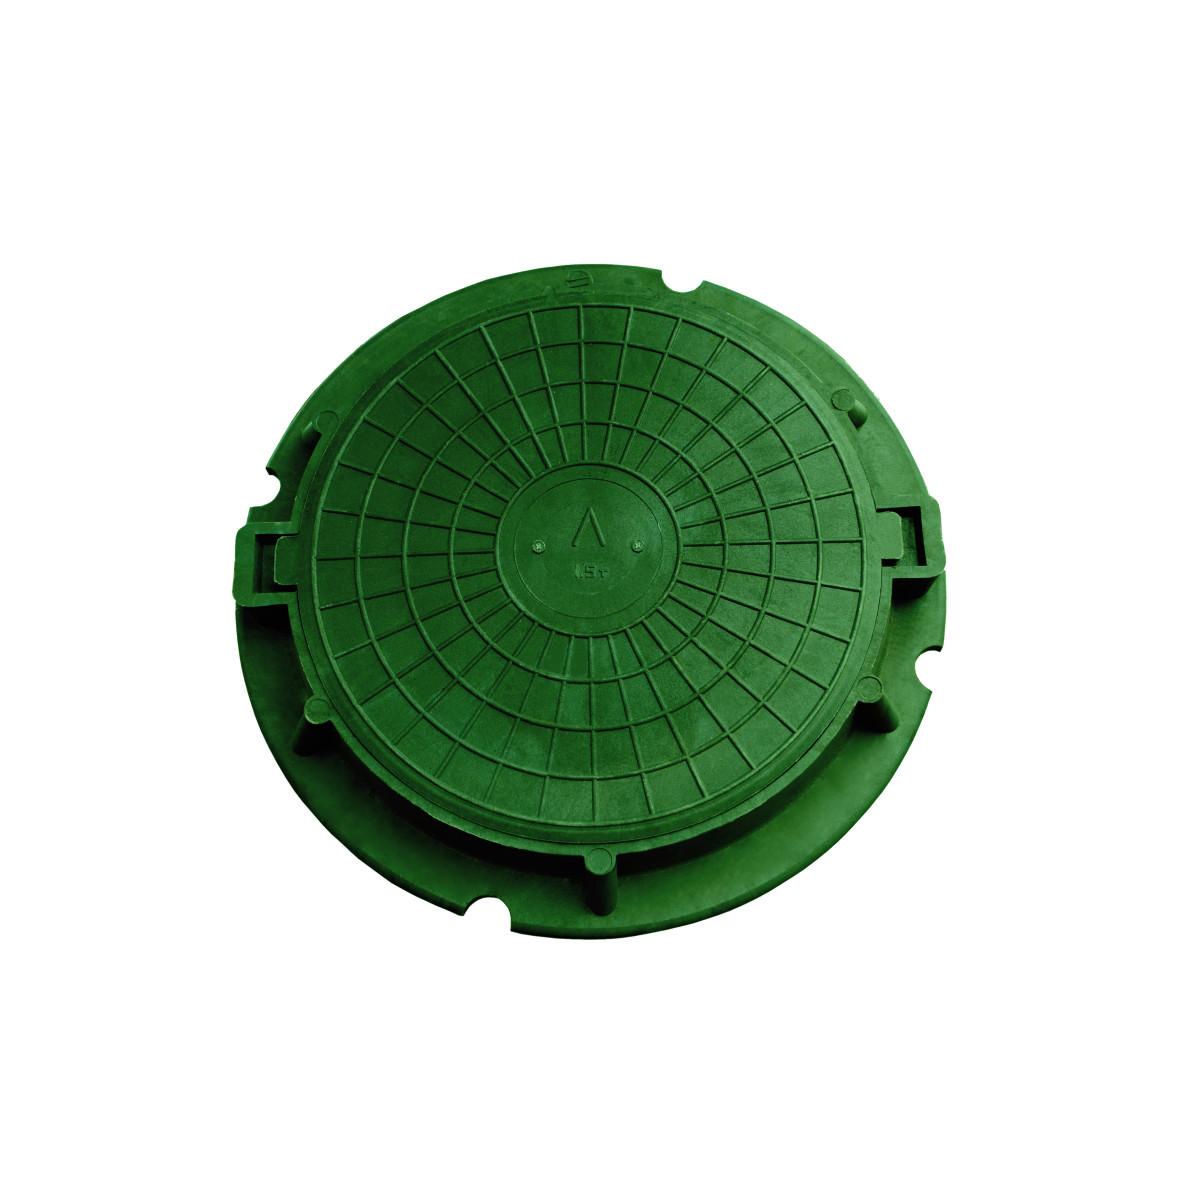 Люк дачный 3 т цвет зелёный